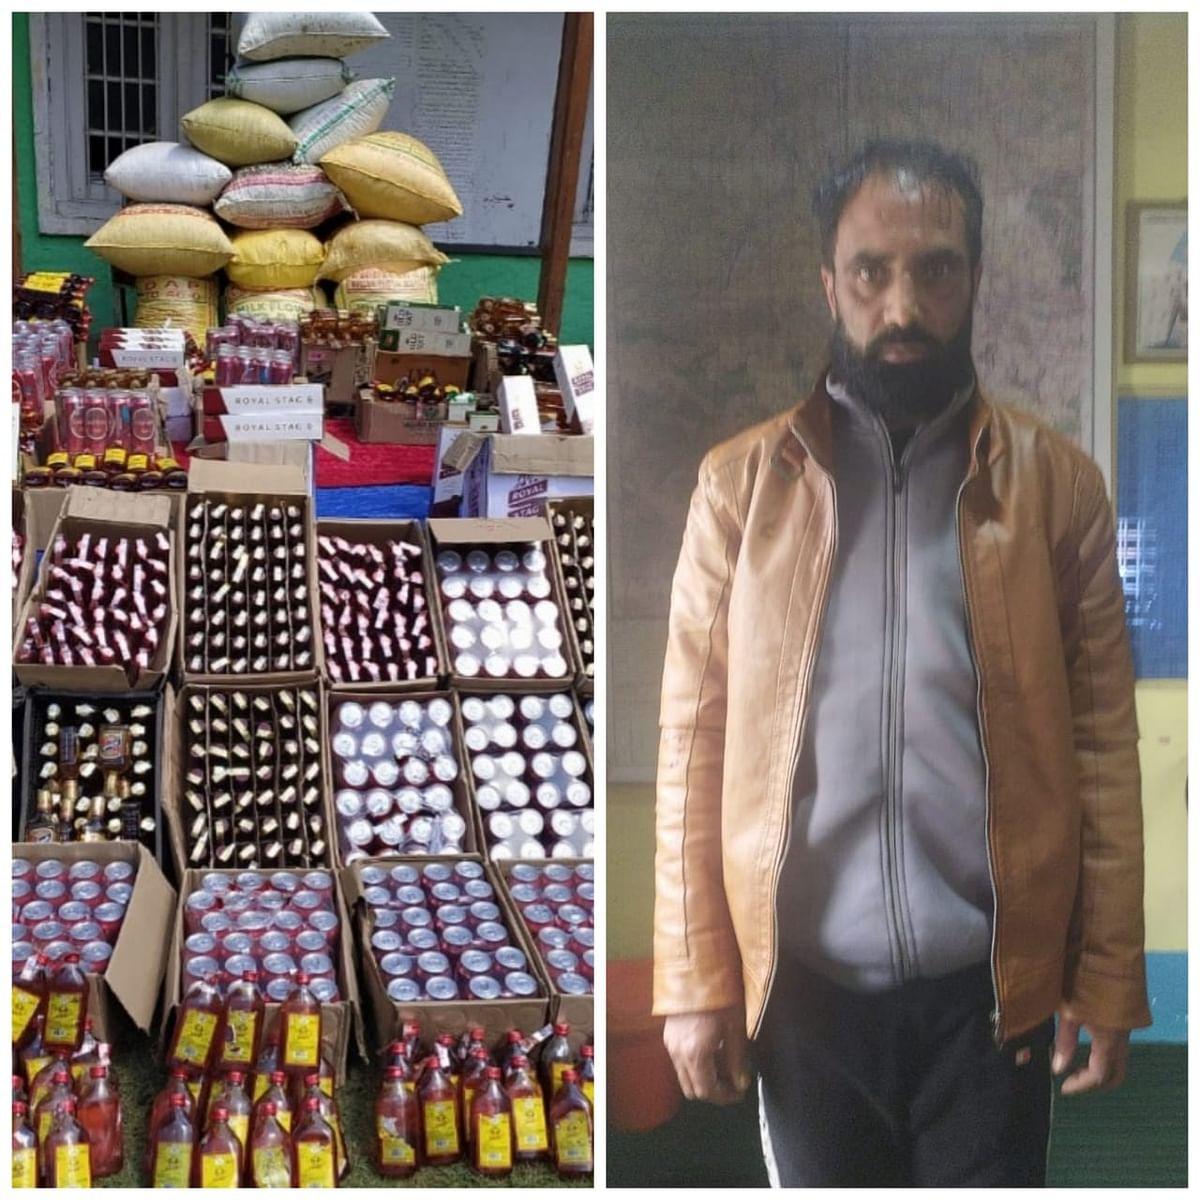 Absconding drug peddler arrested in Kulgam: Police